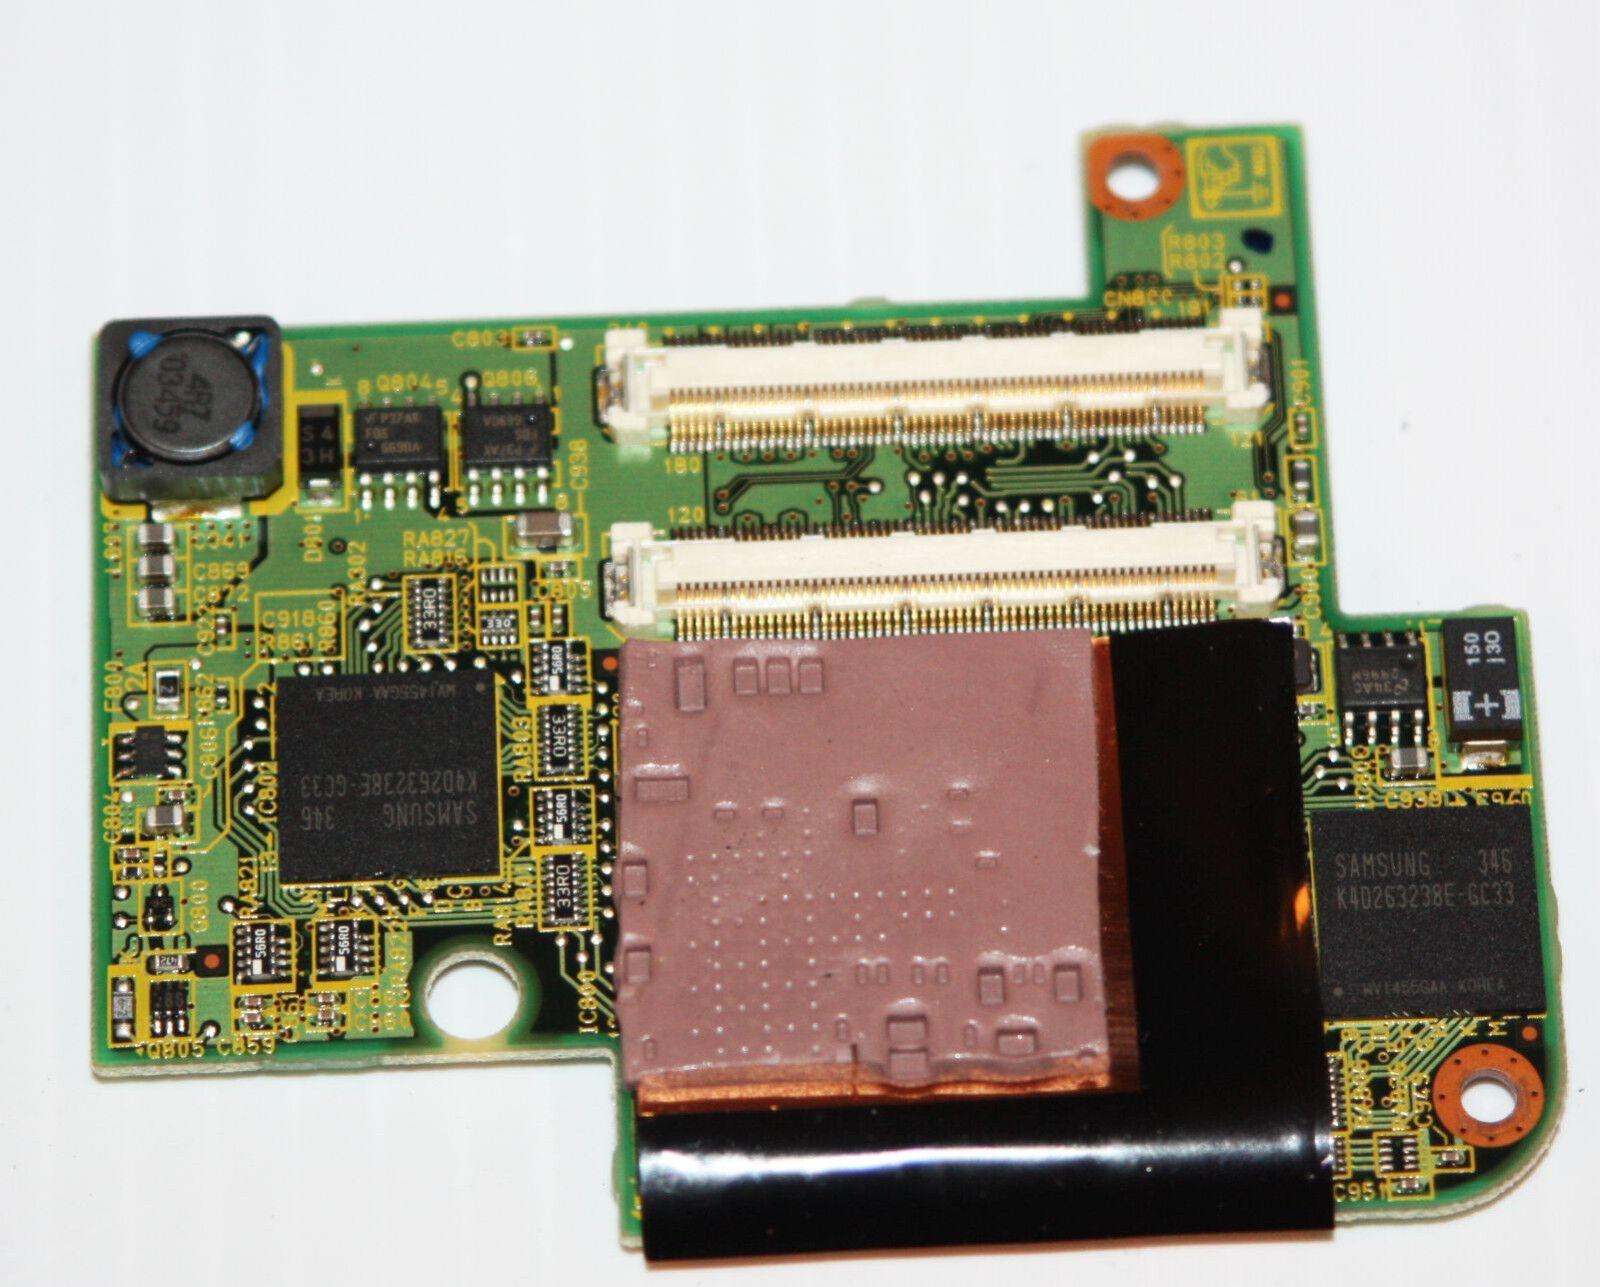 64 MB ATI Video Card #DL3UP1257CAA DFUP1257ZB--Panasonic Toughbook Laptop CF-73